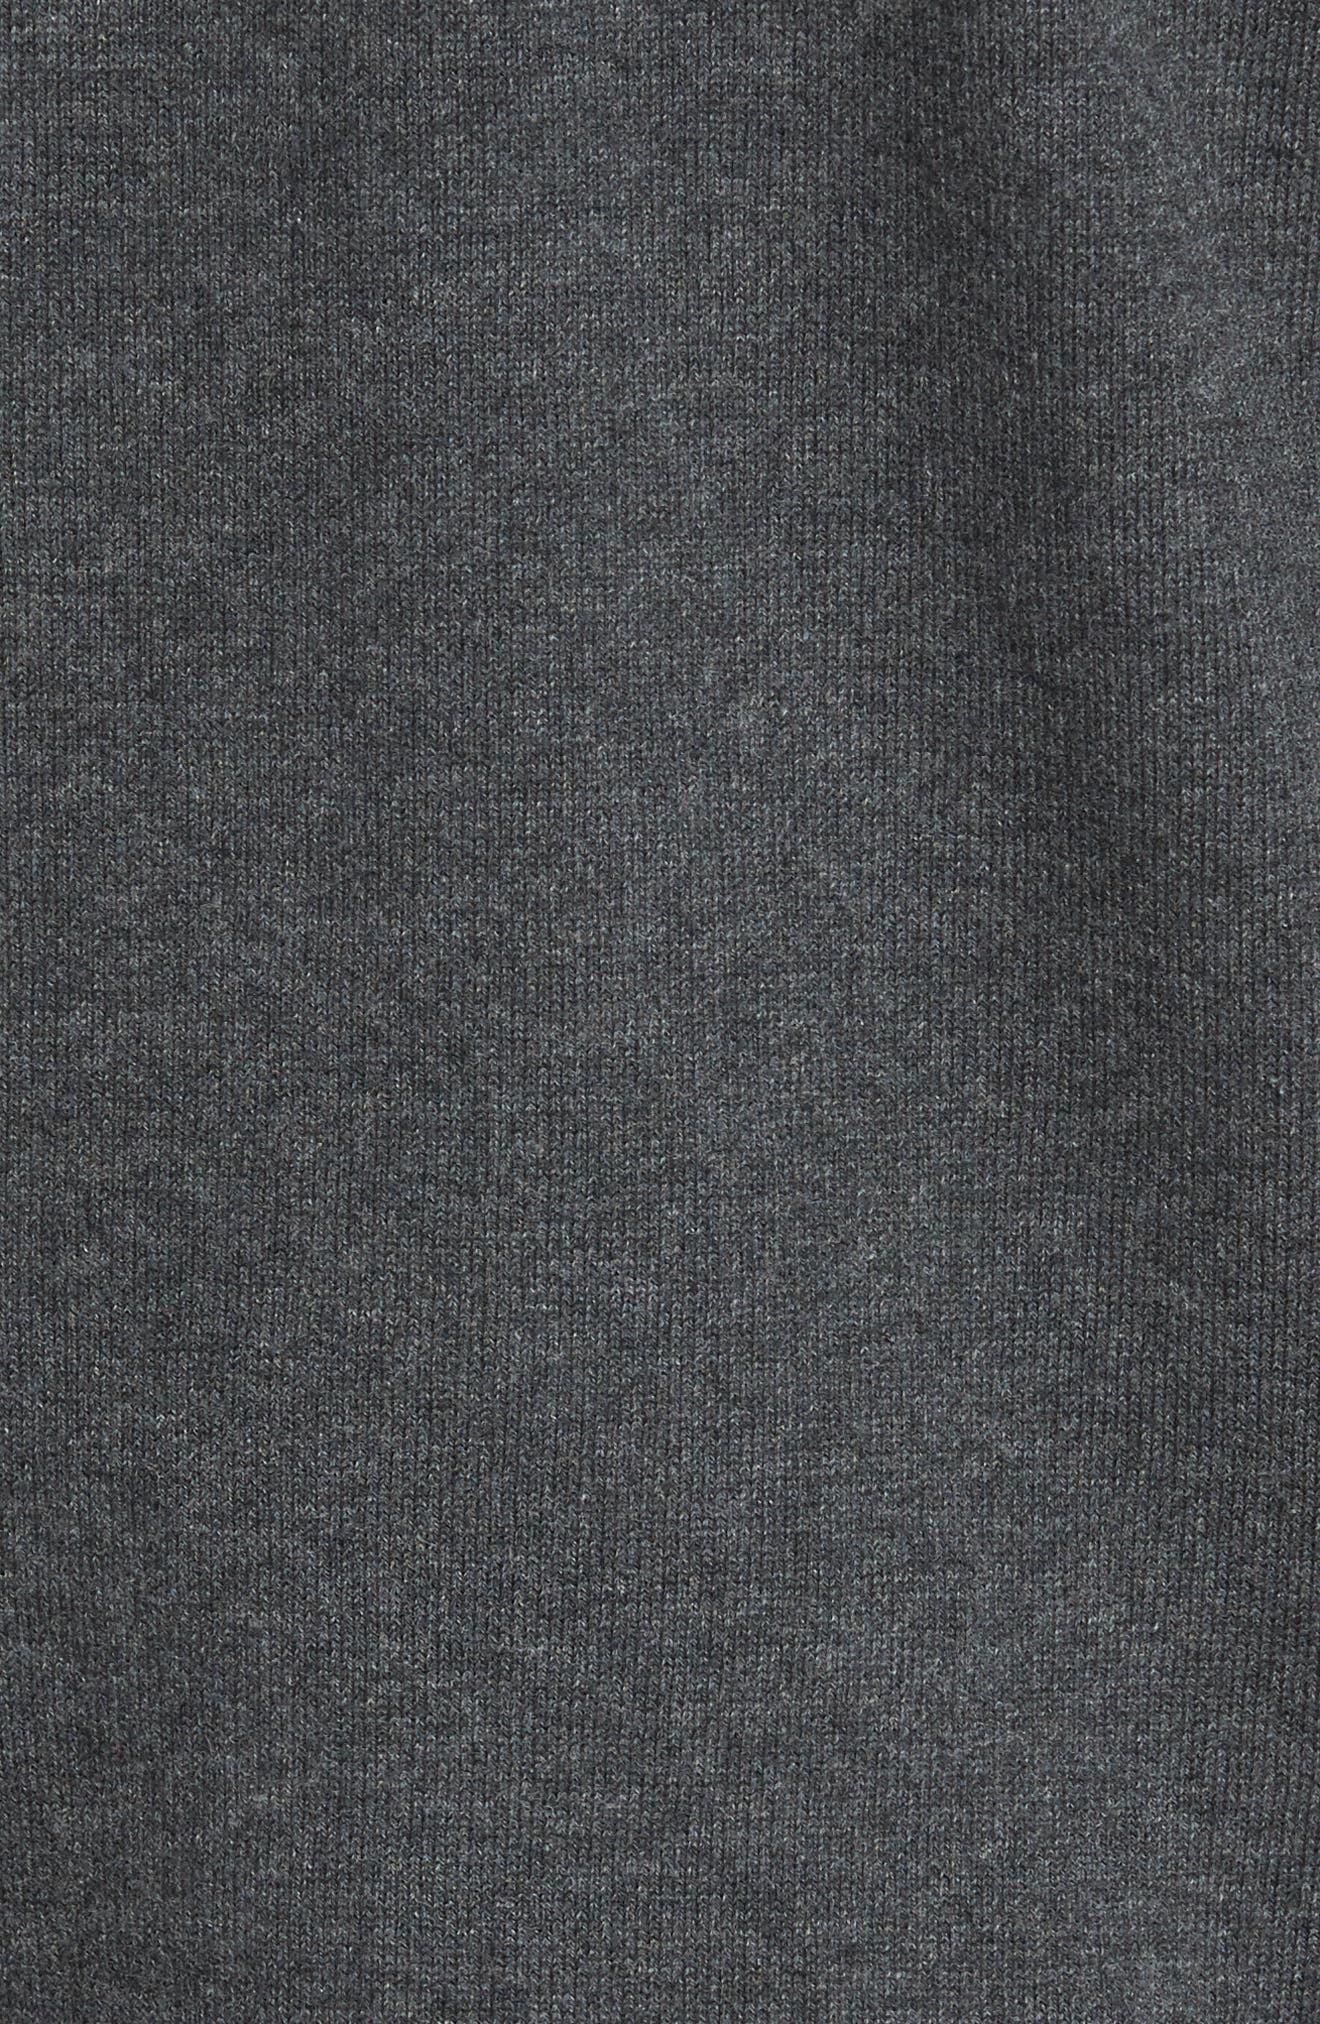 Seattle Seahawks - Lakemont Regular Fit Quarter Zip Sweater,                             Alternate thumbnail 5, color,                             CHARCOAL HEATHER